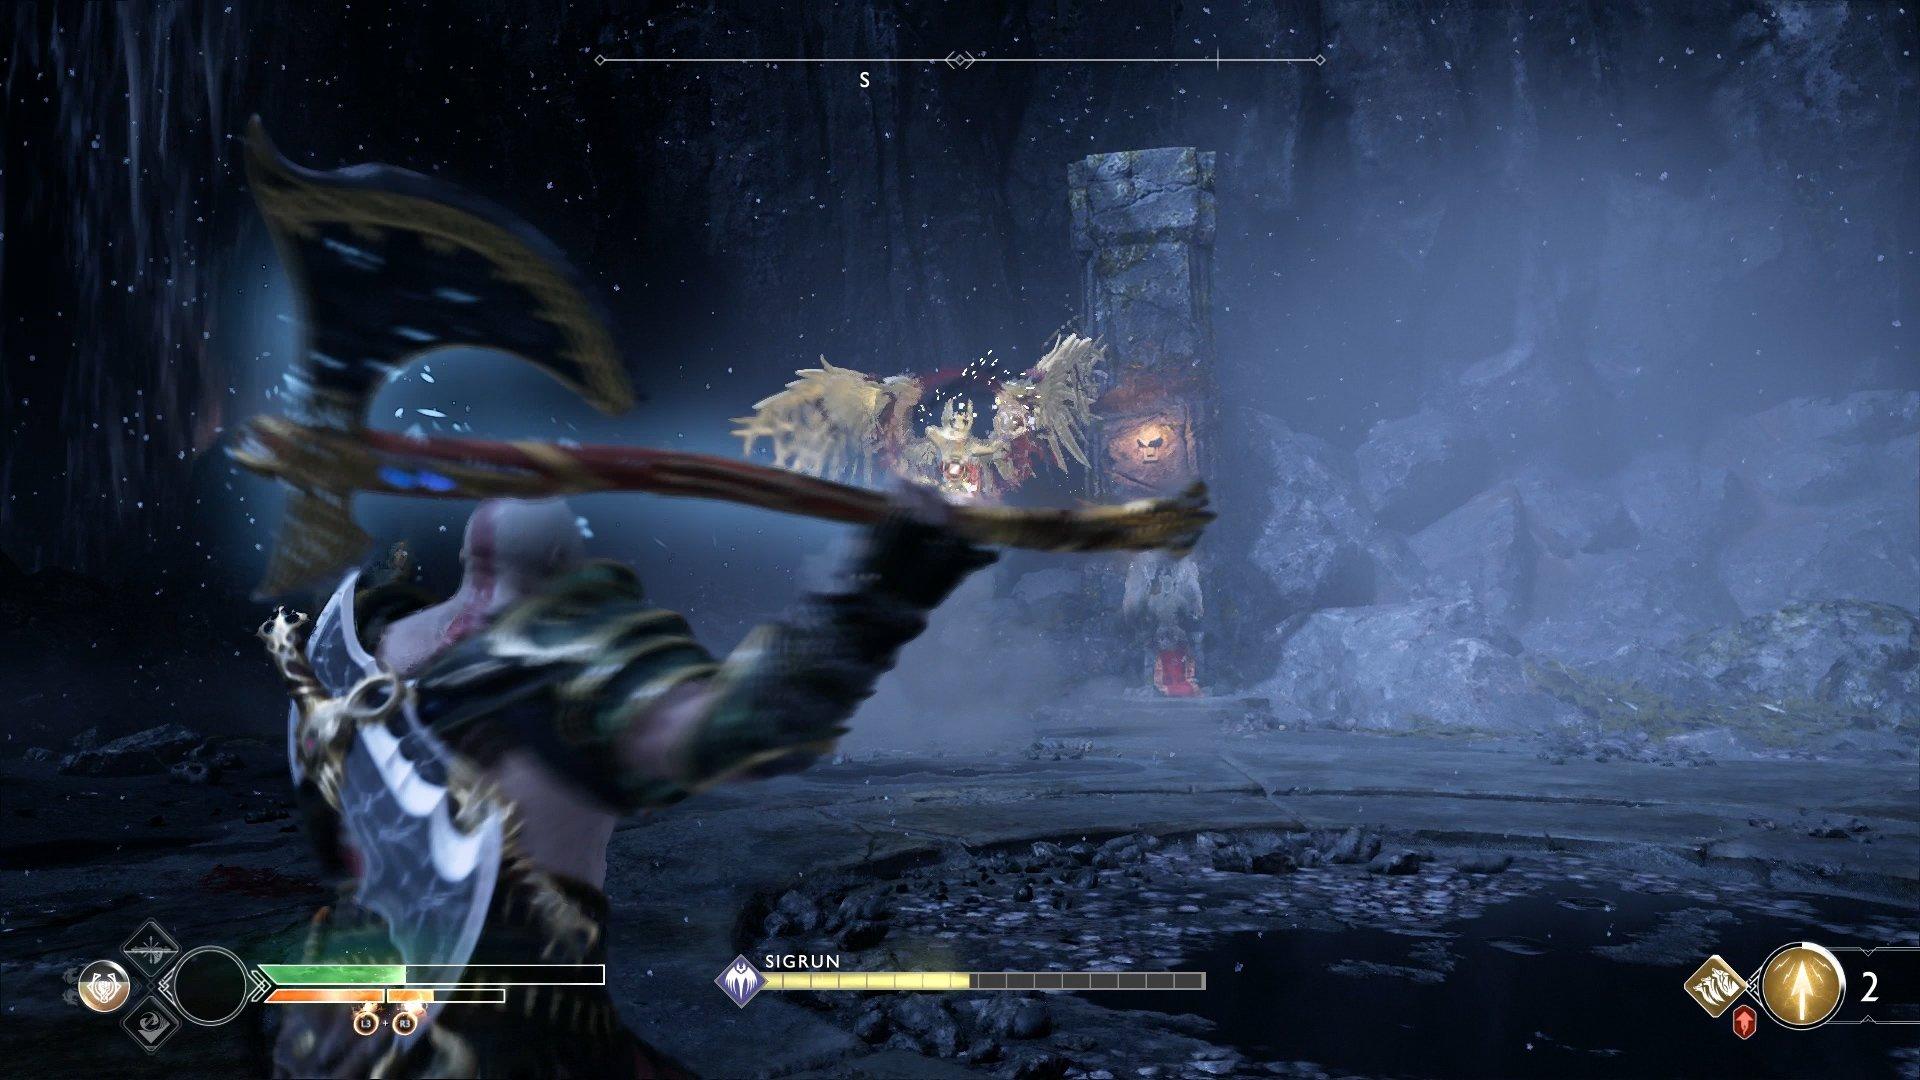 god of war valkyrie queen sigrun throw leviathan axe